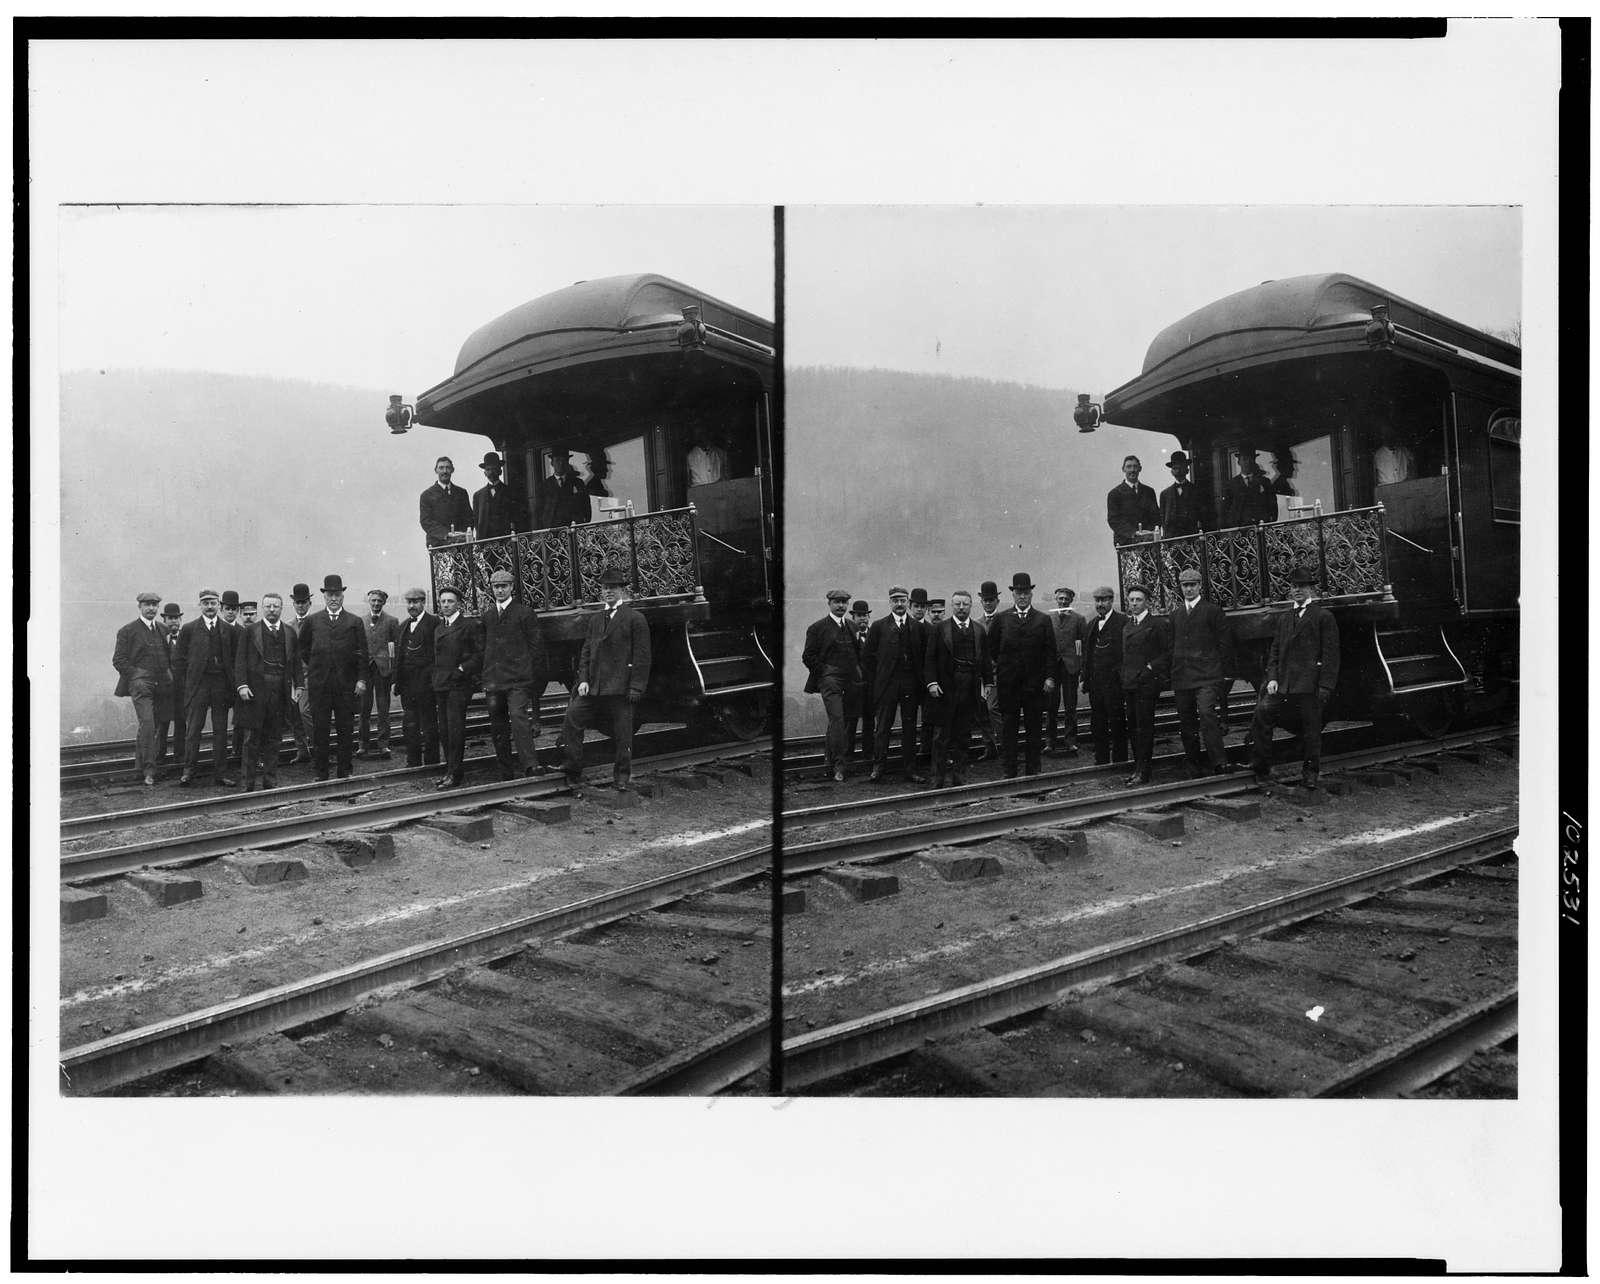 [President Roosevelt, standing with twelve other men on railroad tracks, in front of locomotive]